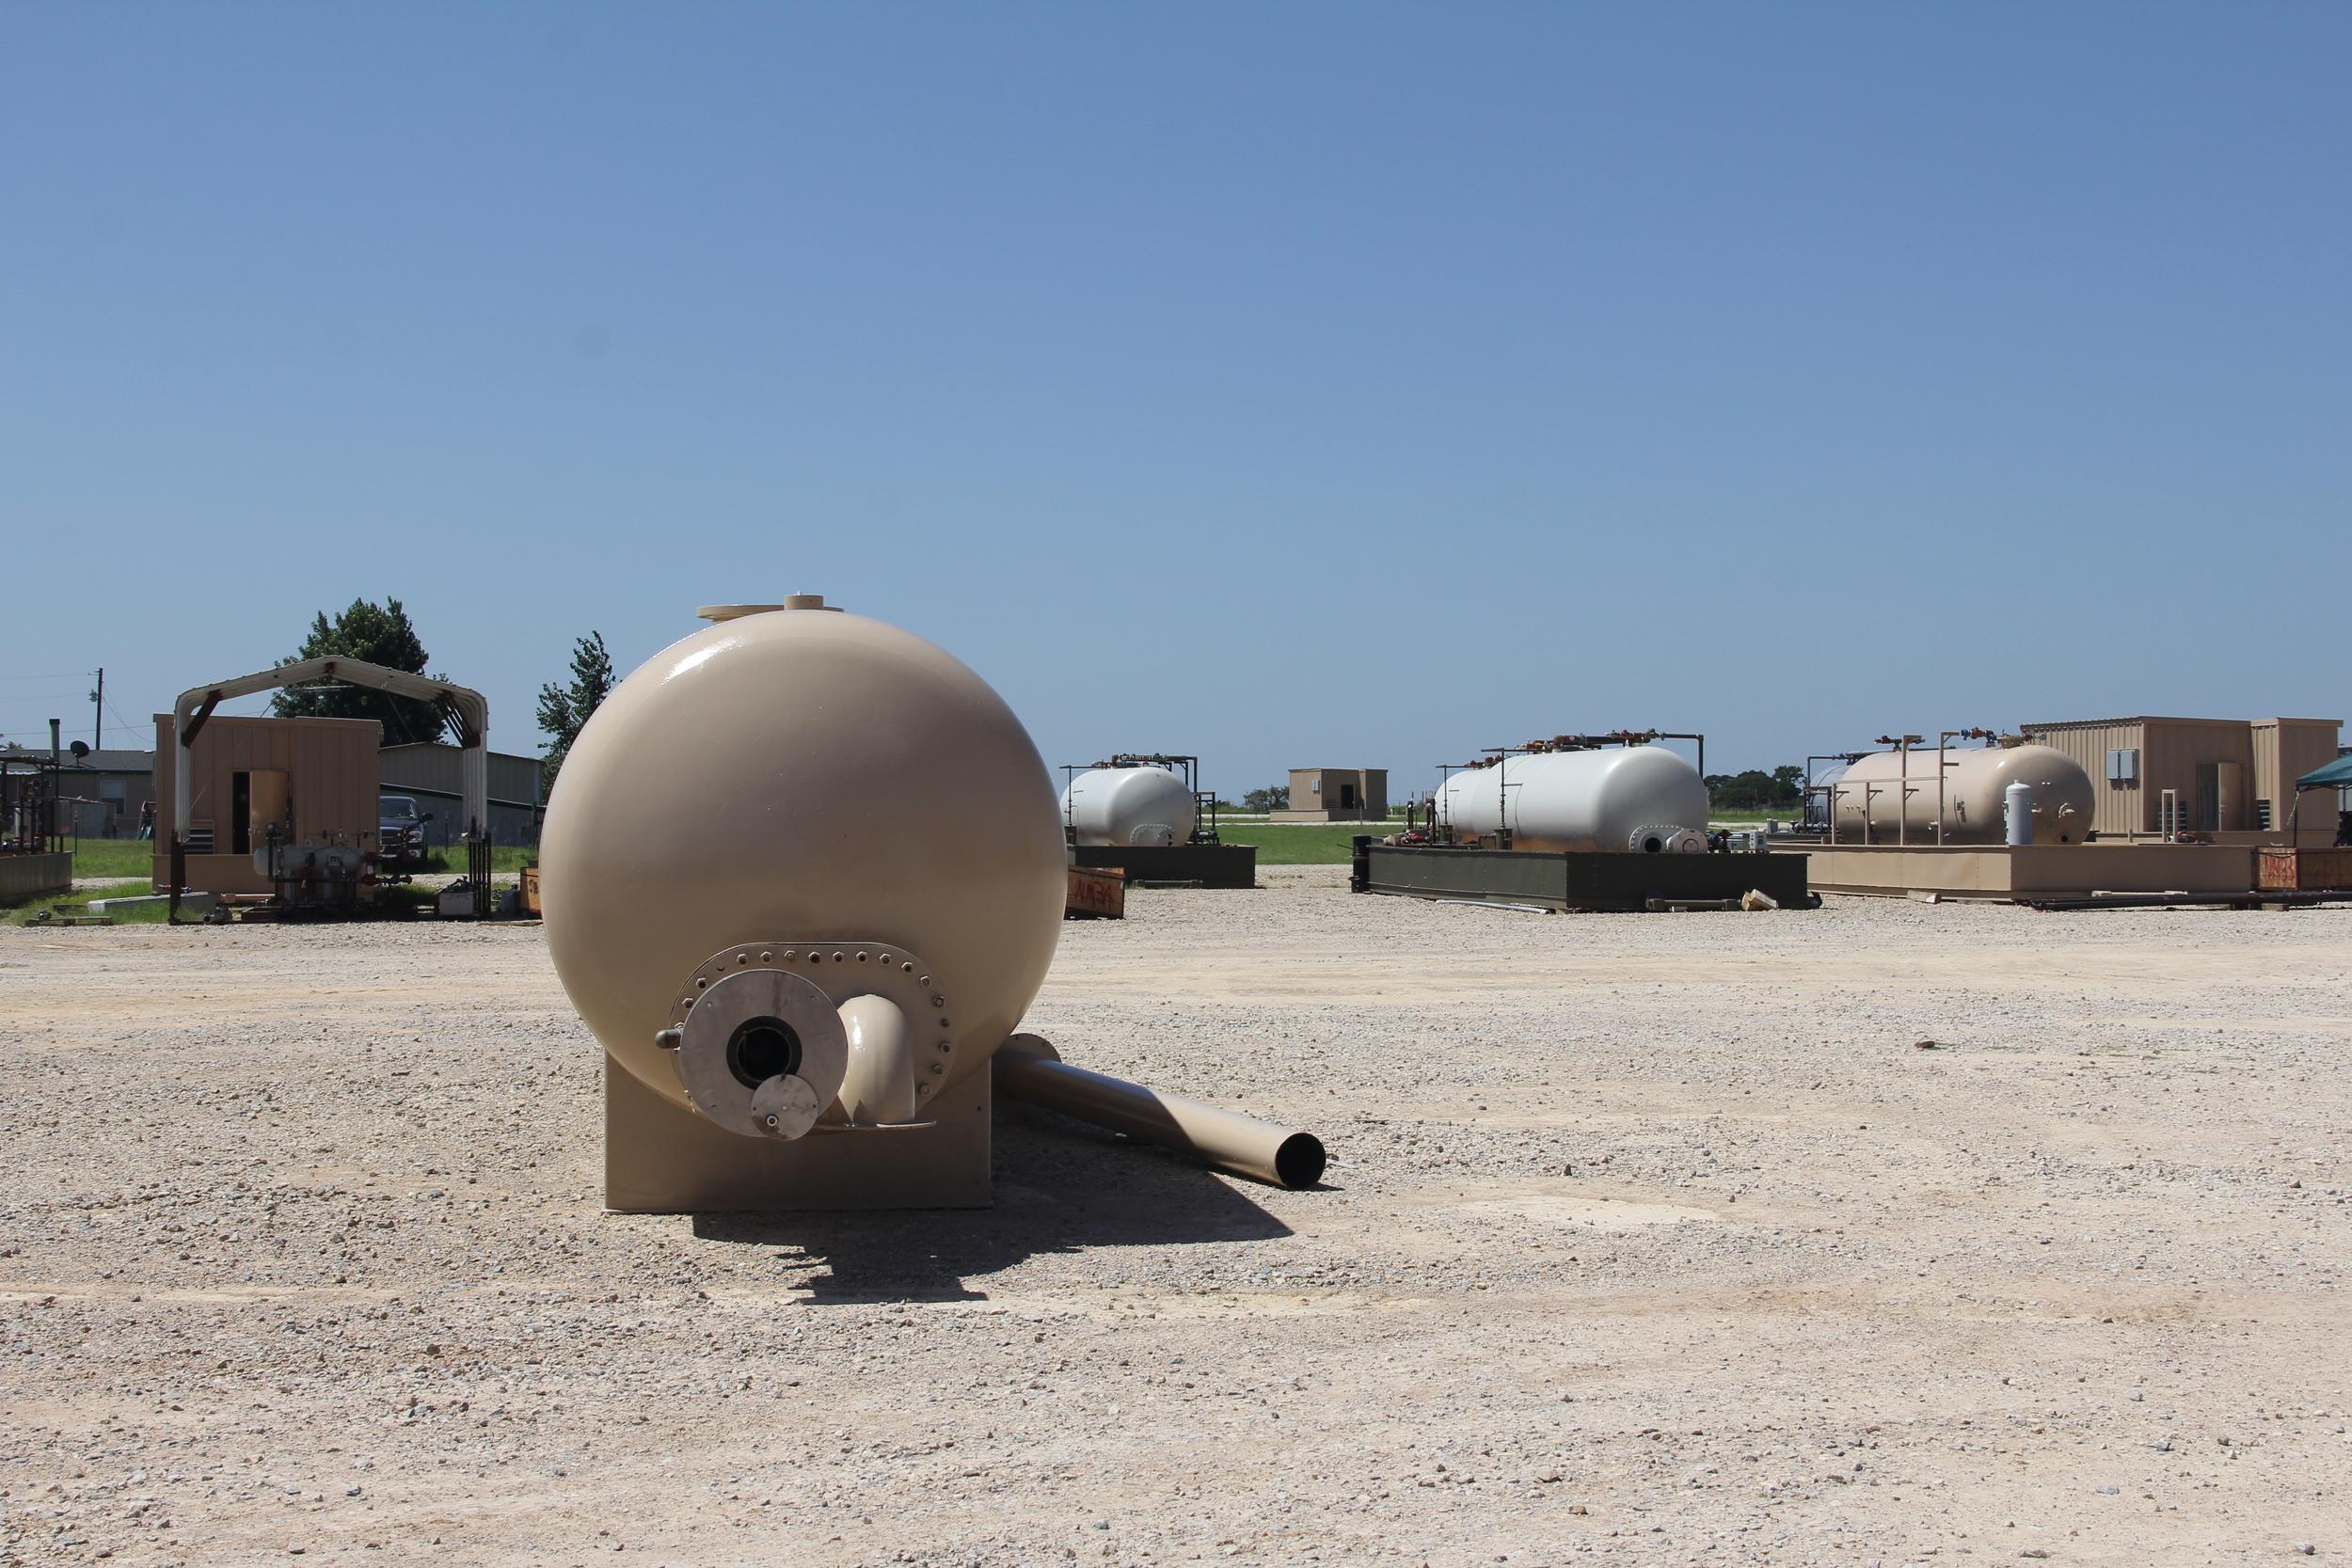 containment tanks